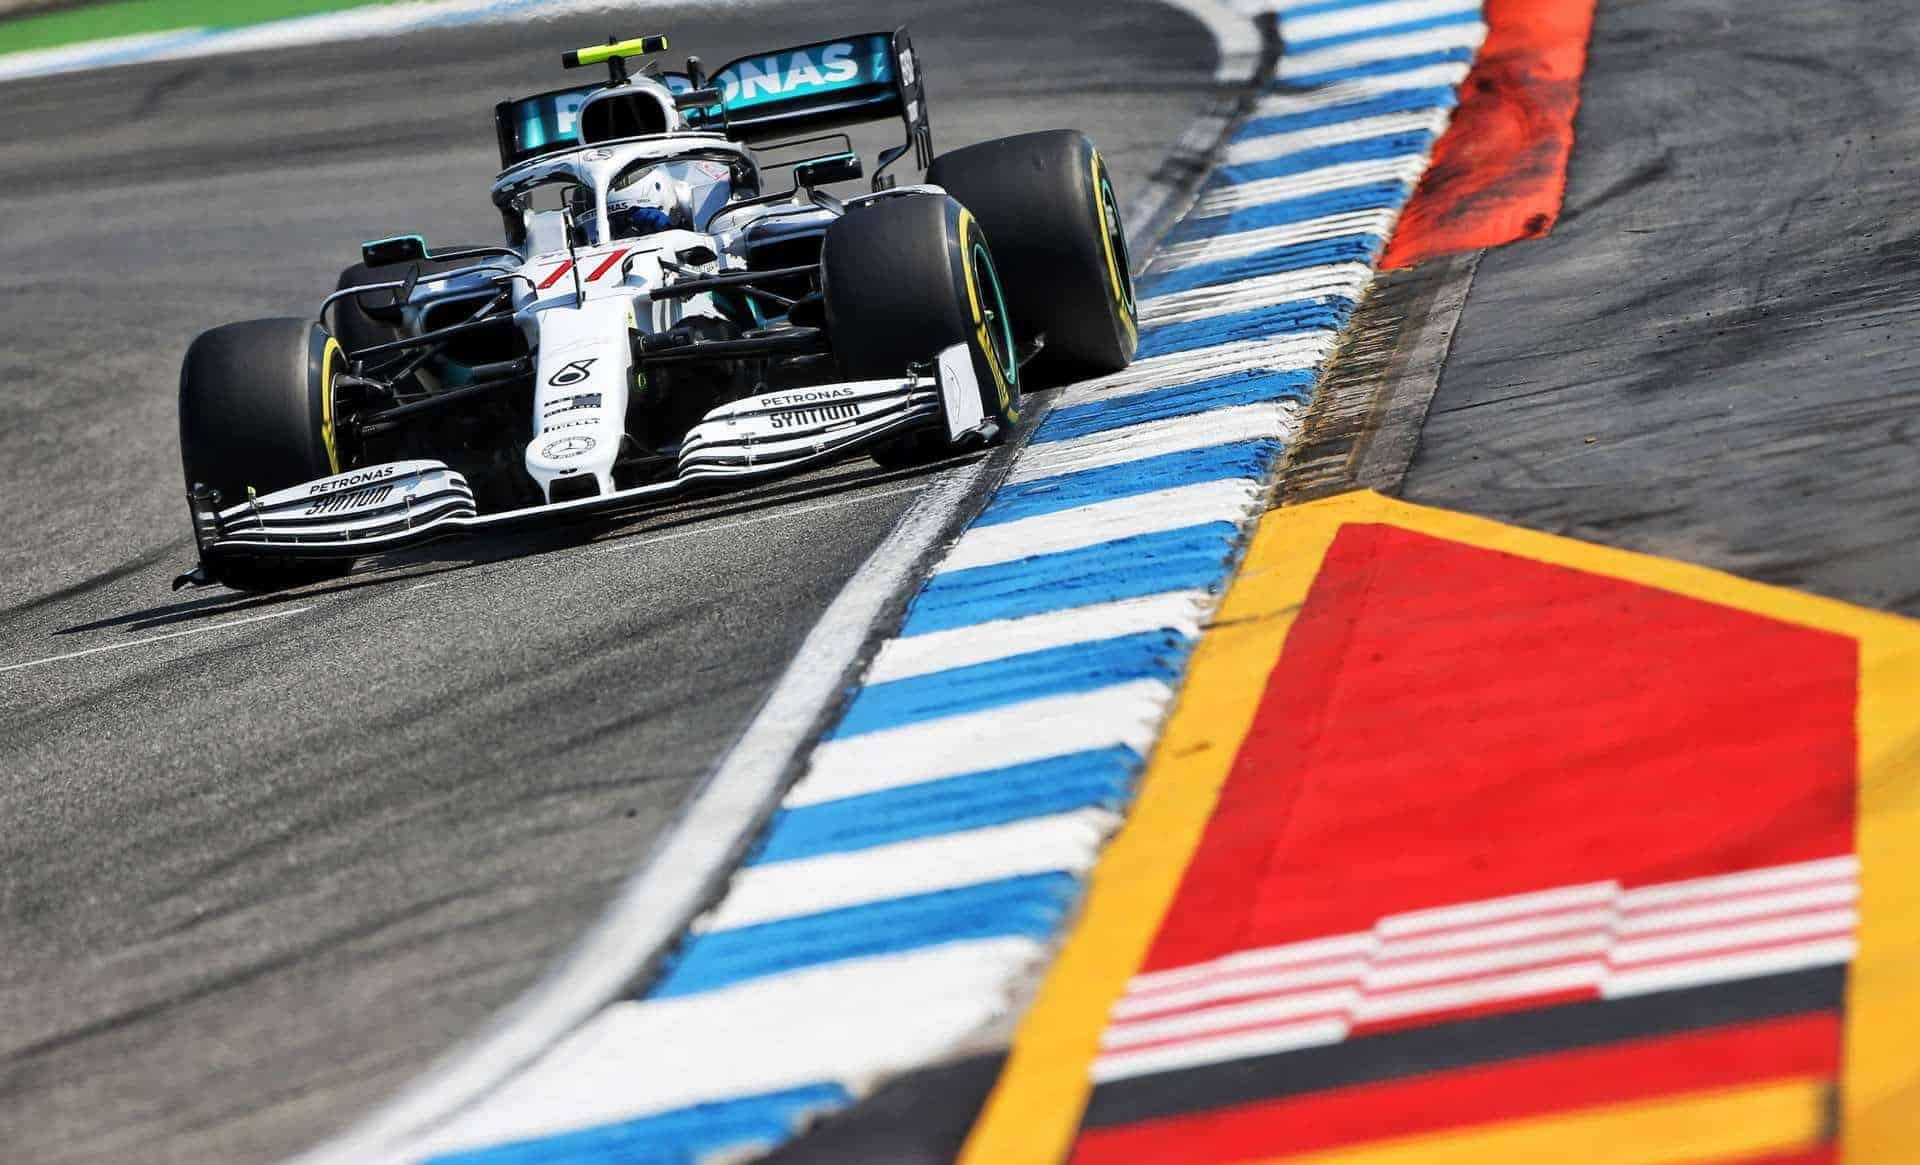 Valtteri Bottas Mercedes F1 W10 German GP F1 2019 Photo Daimler